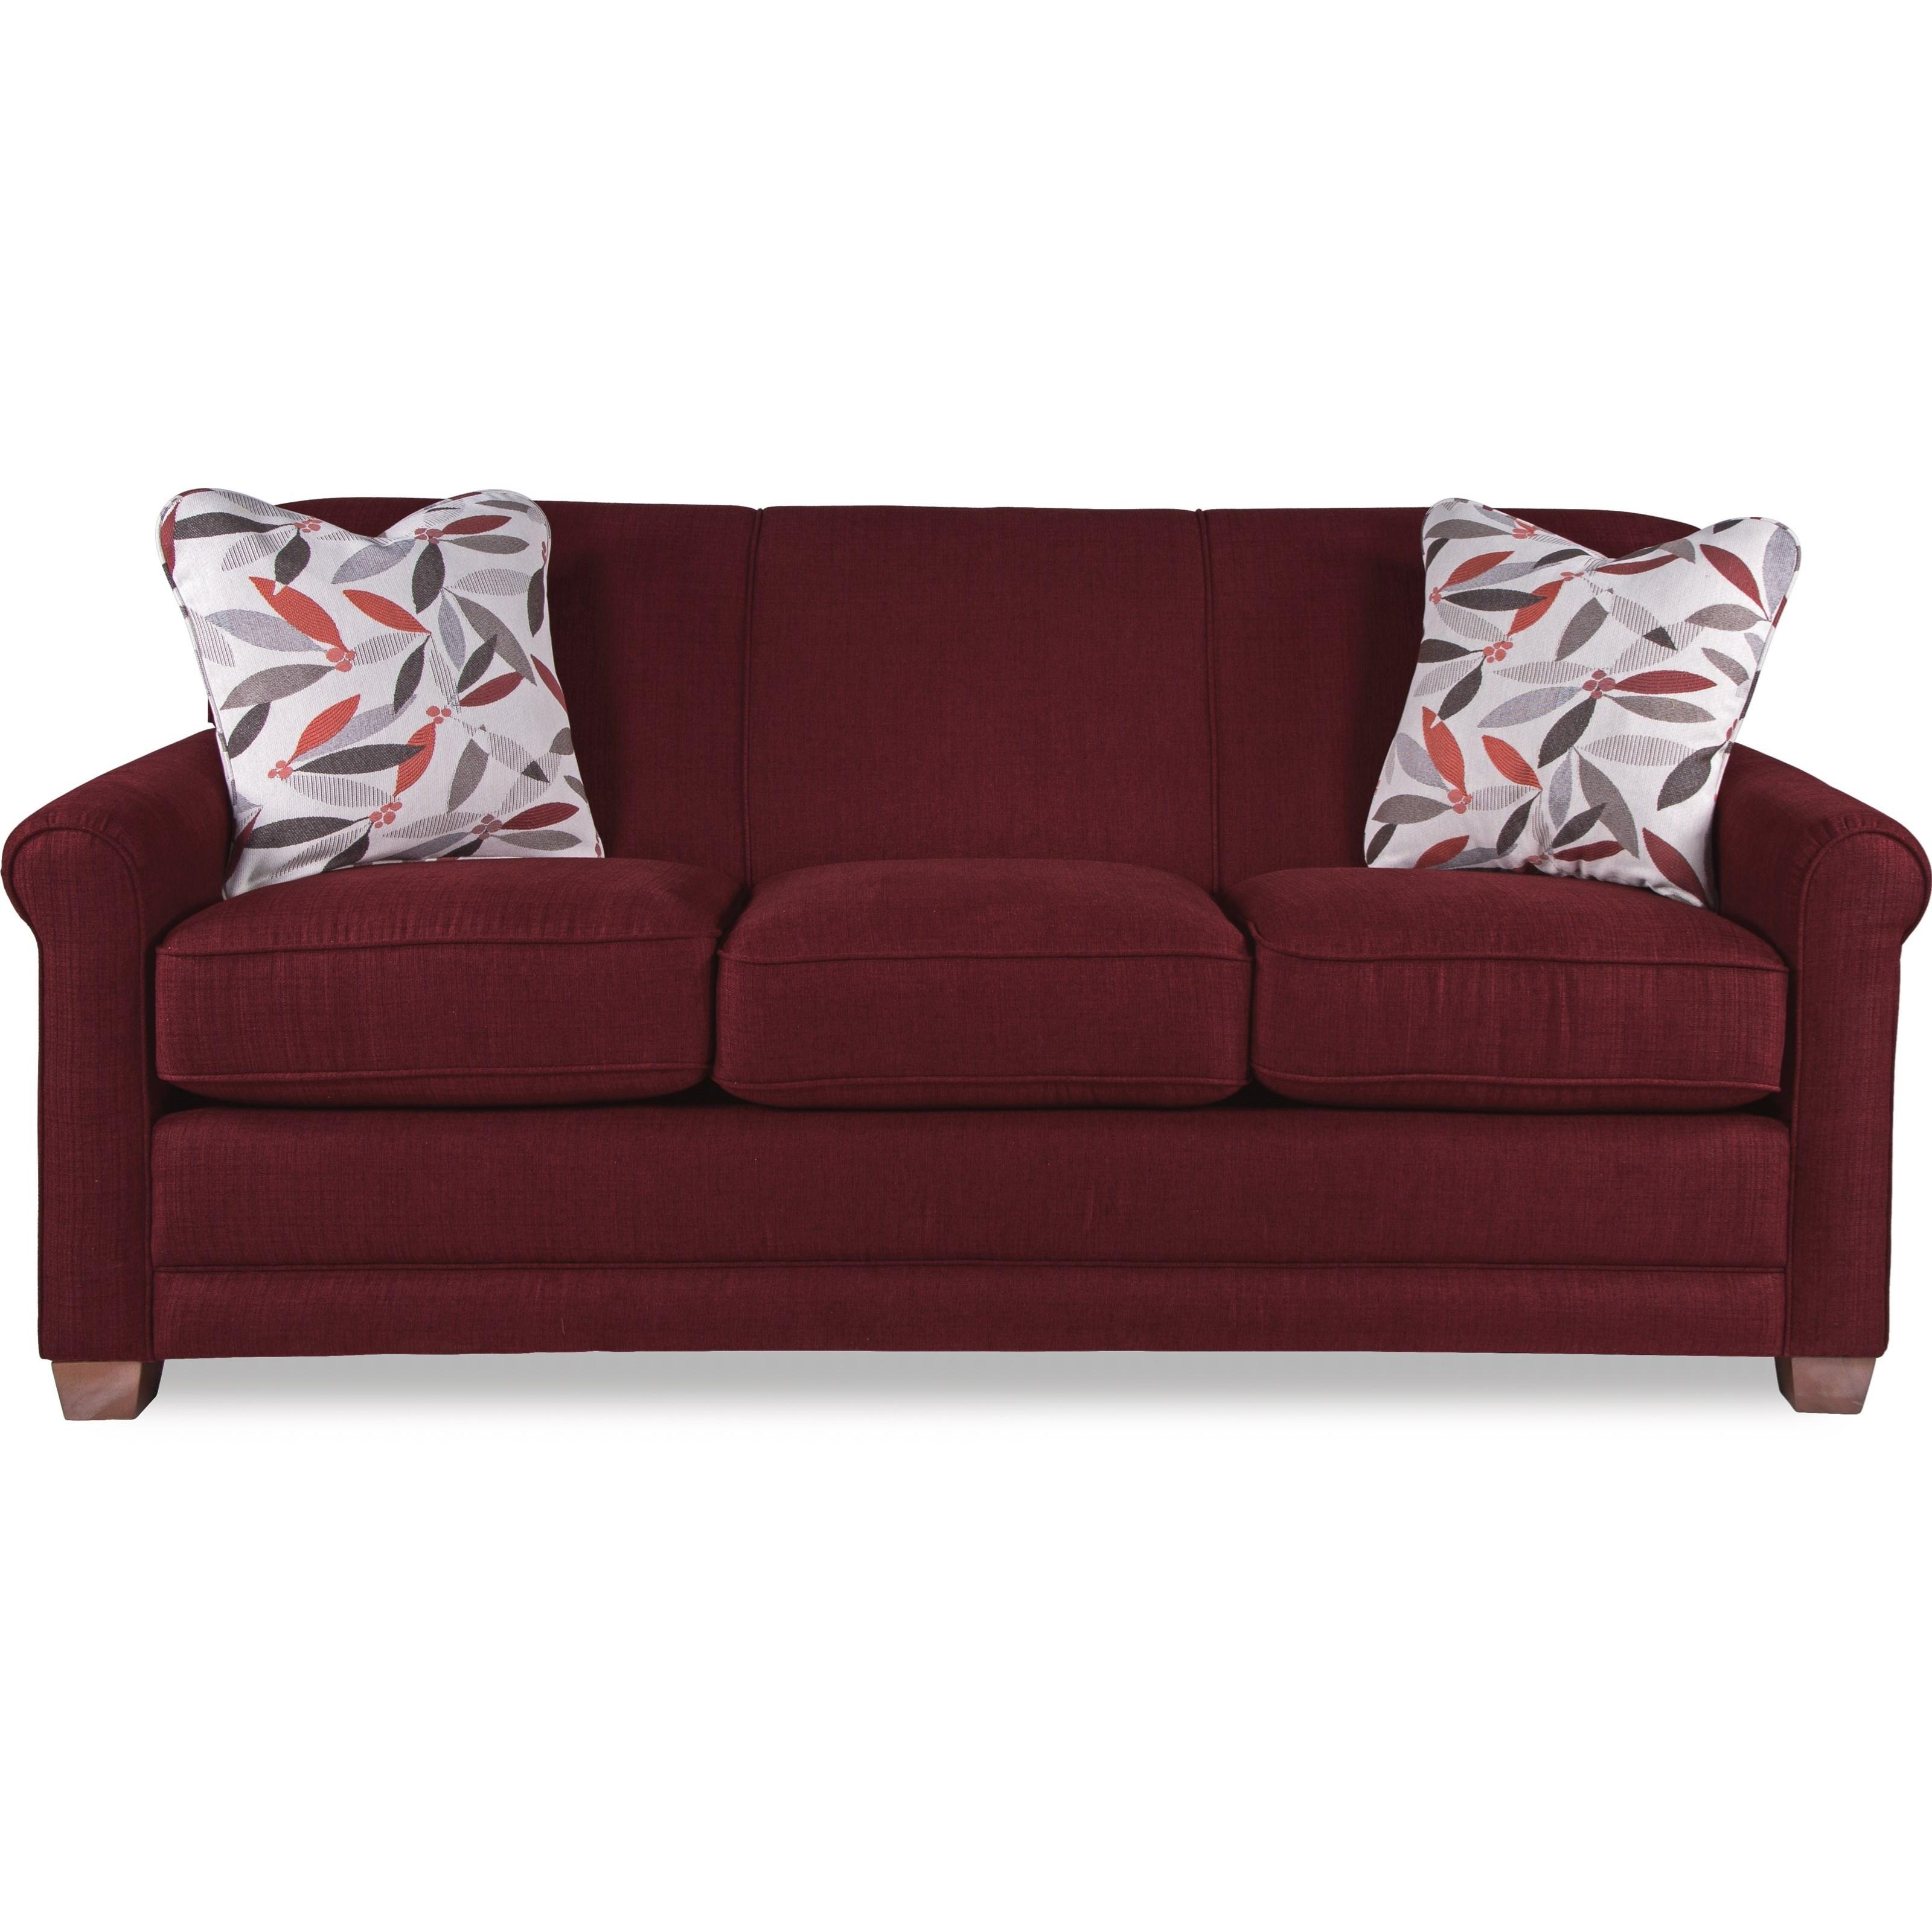 Amanda Queen Sleeper Sofa by La-Z-Boy at SuperStore